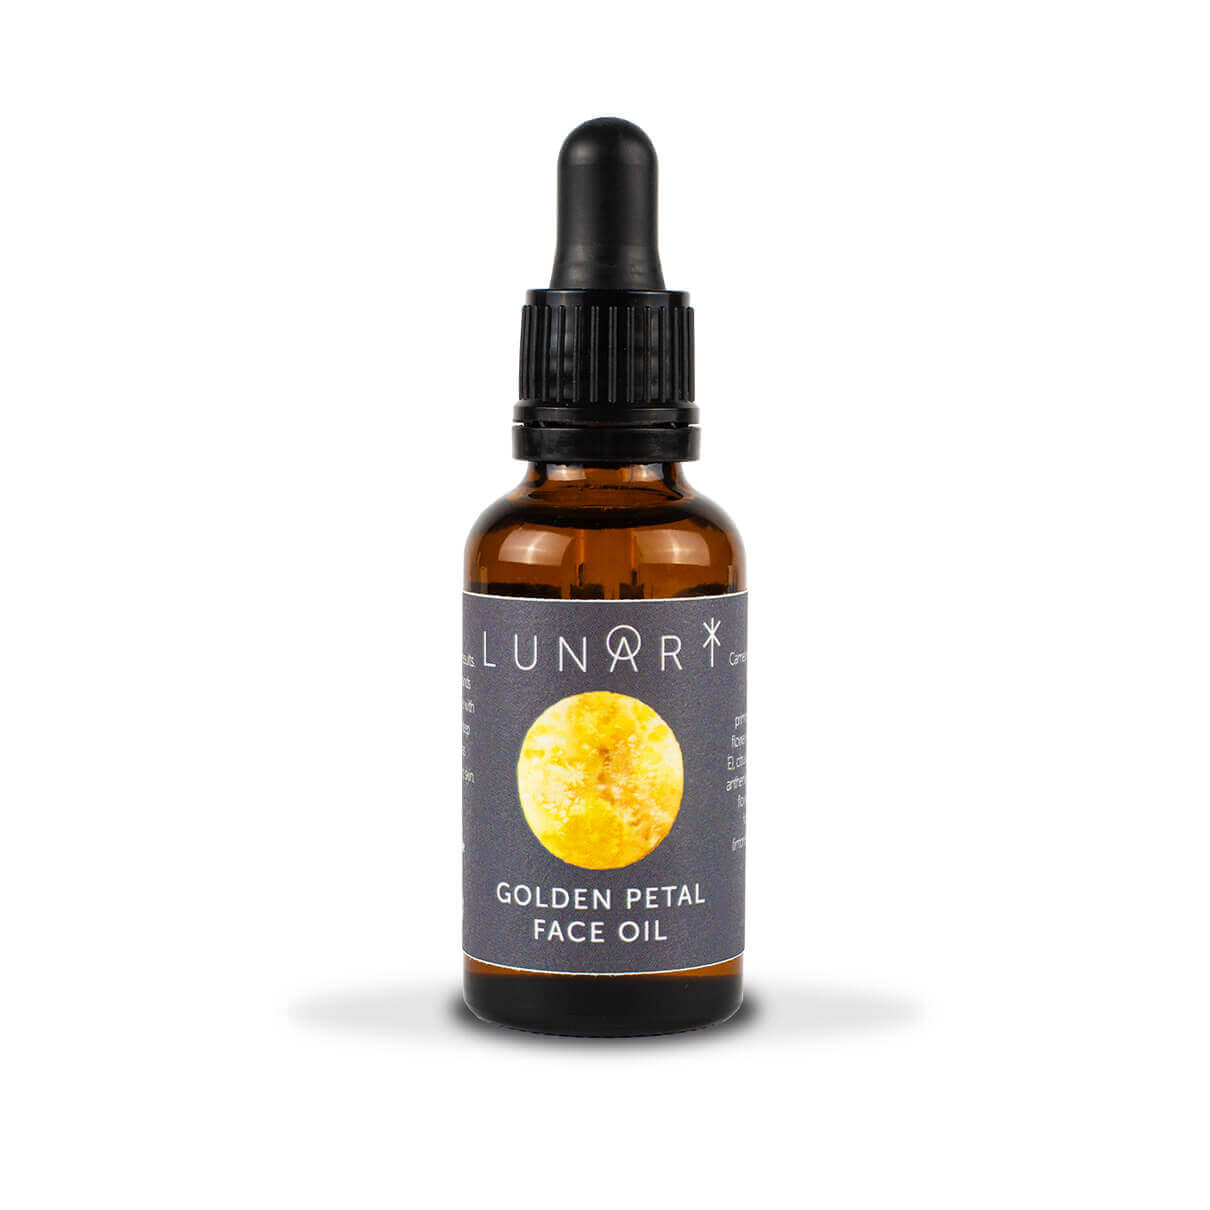 Lunari Golden Petal Oil